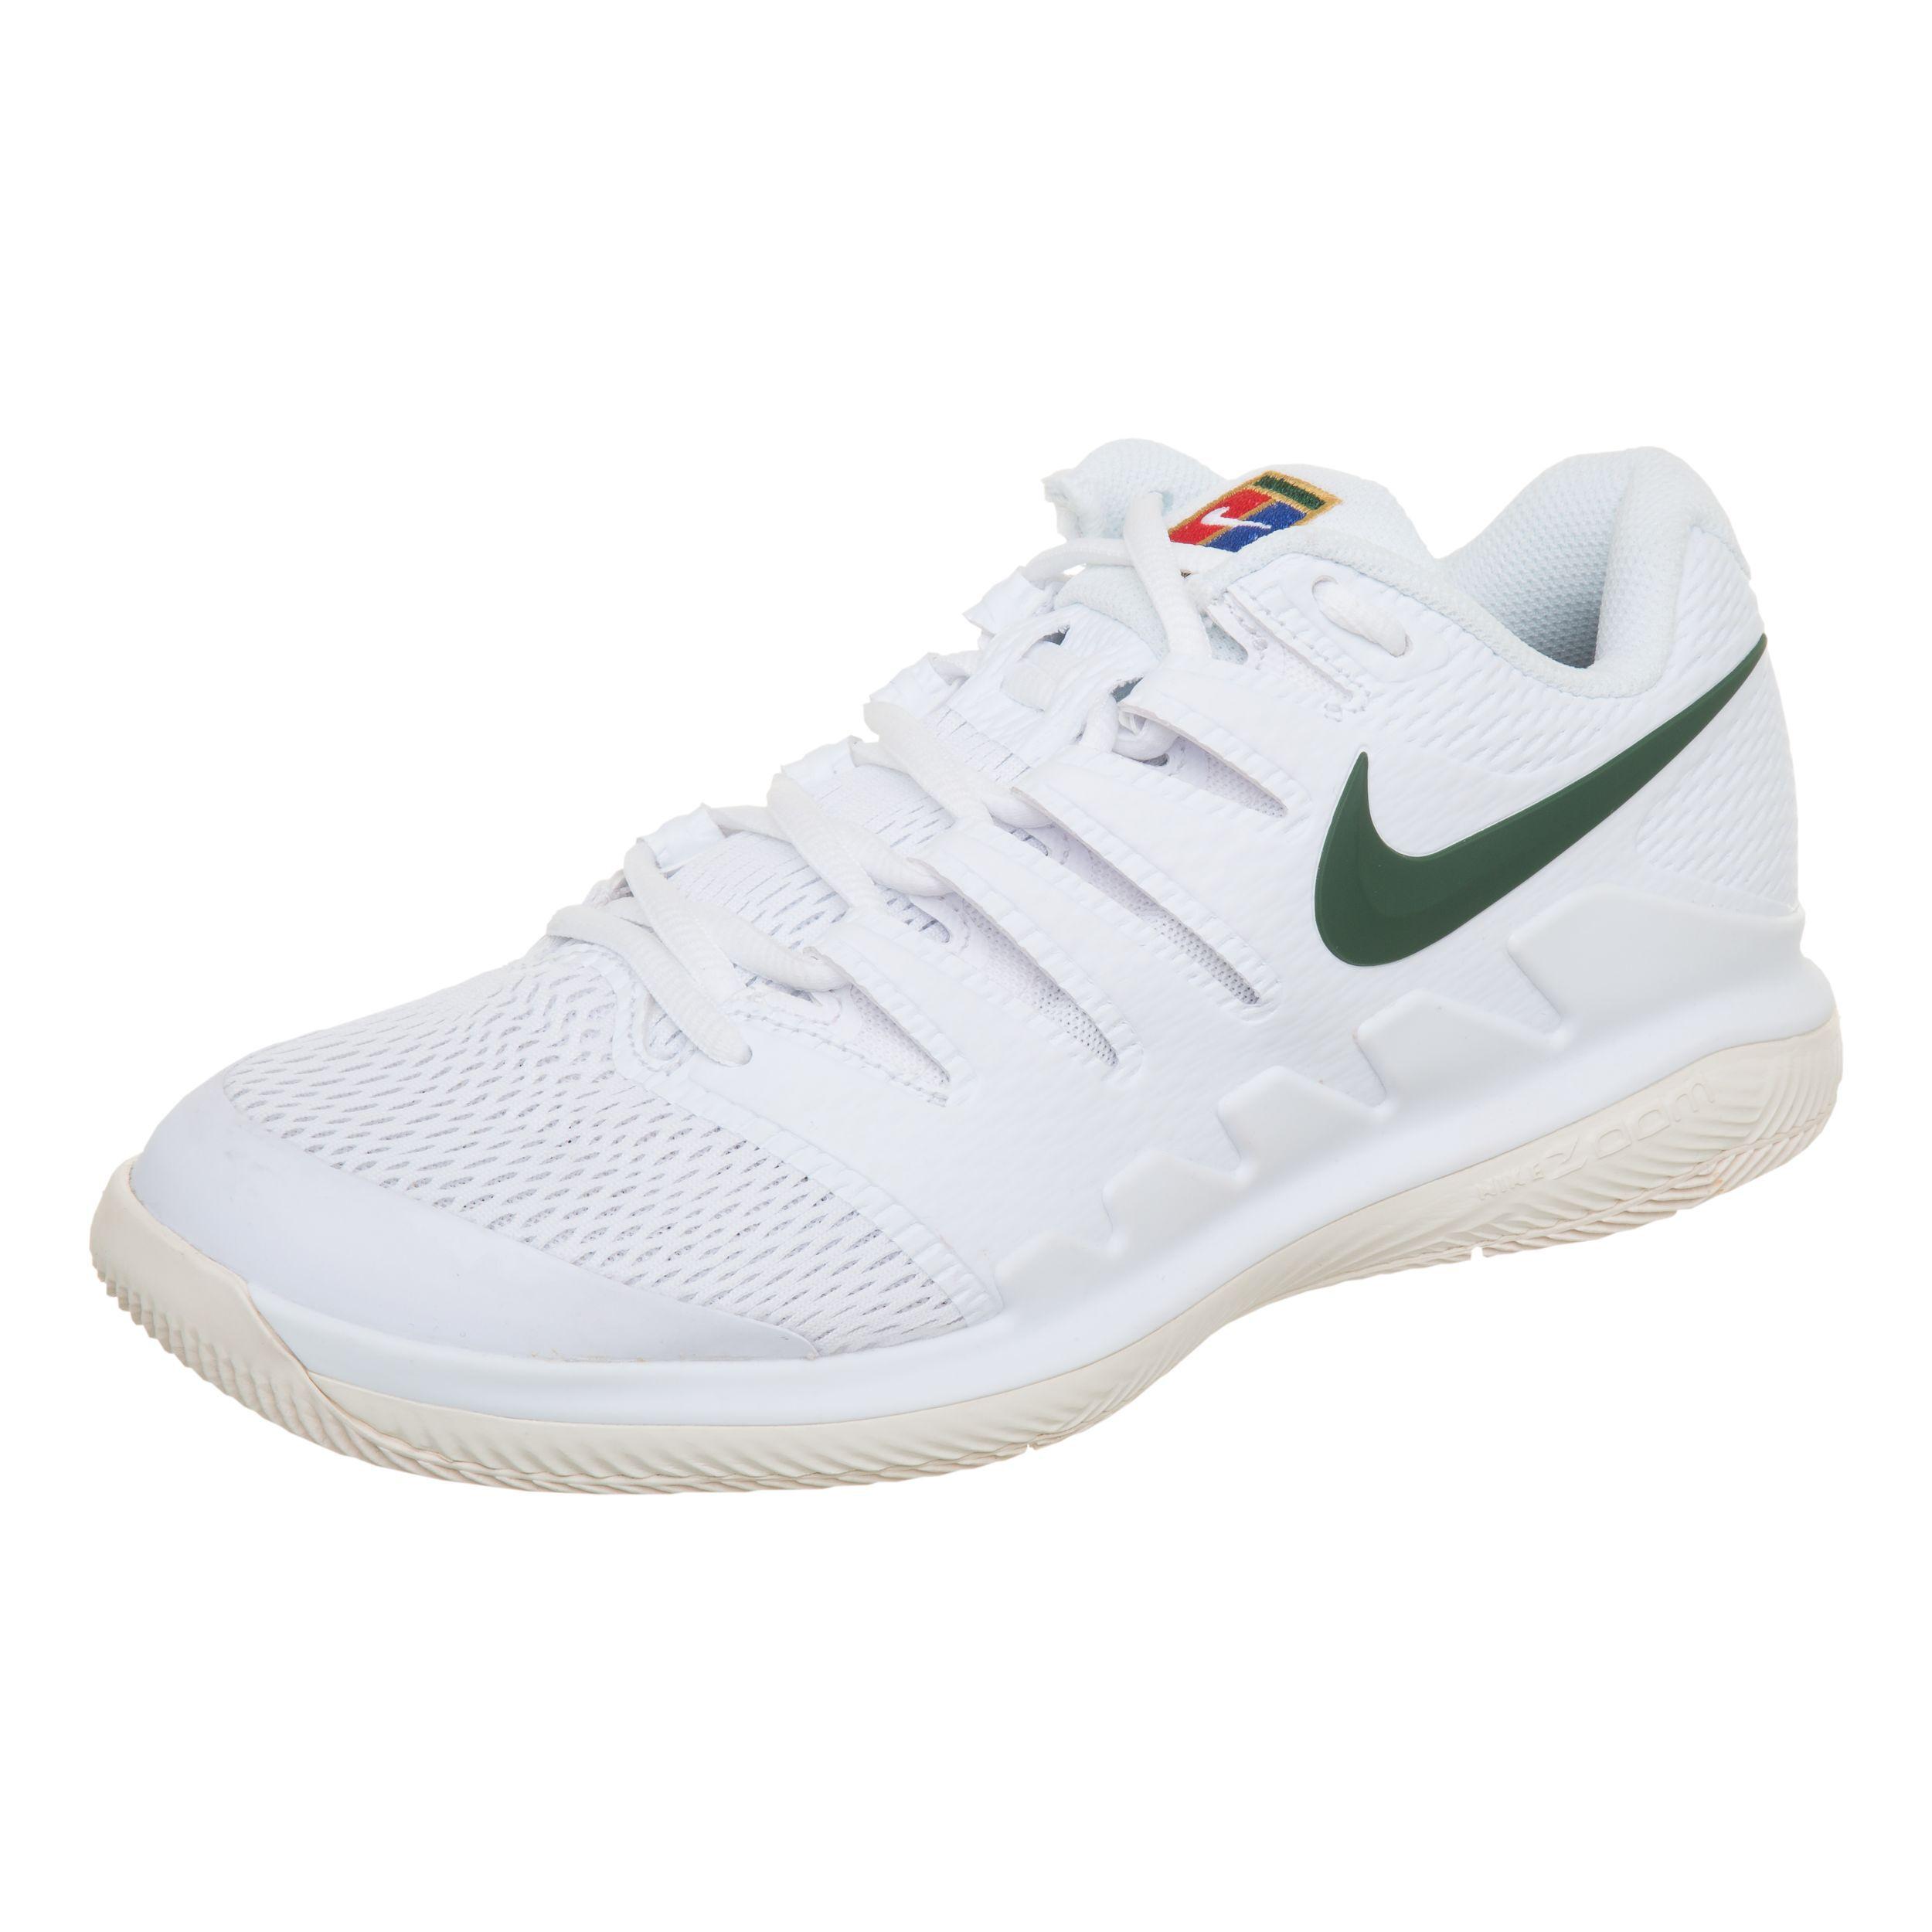 Nike Air Zoom Vapor X Chaussures Toutes Surfaces Femmes - Blanc ...